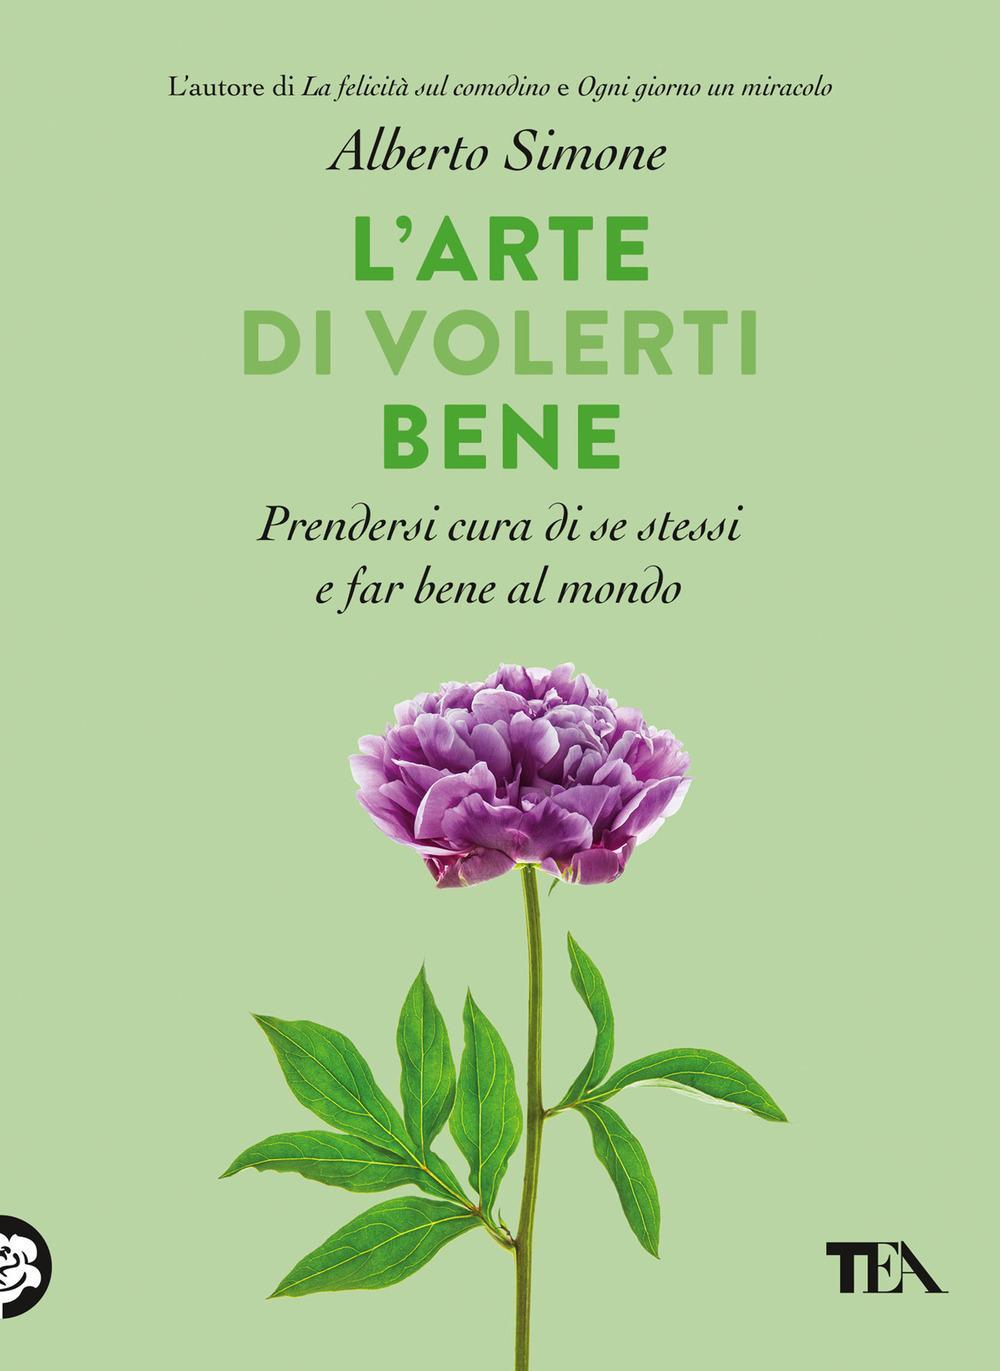 L'ARTE DI VOLERTI BENE A. Simone